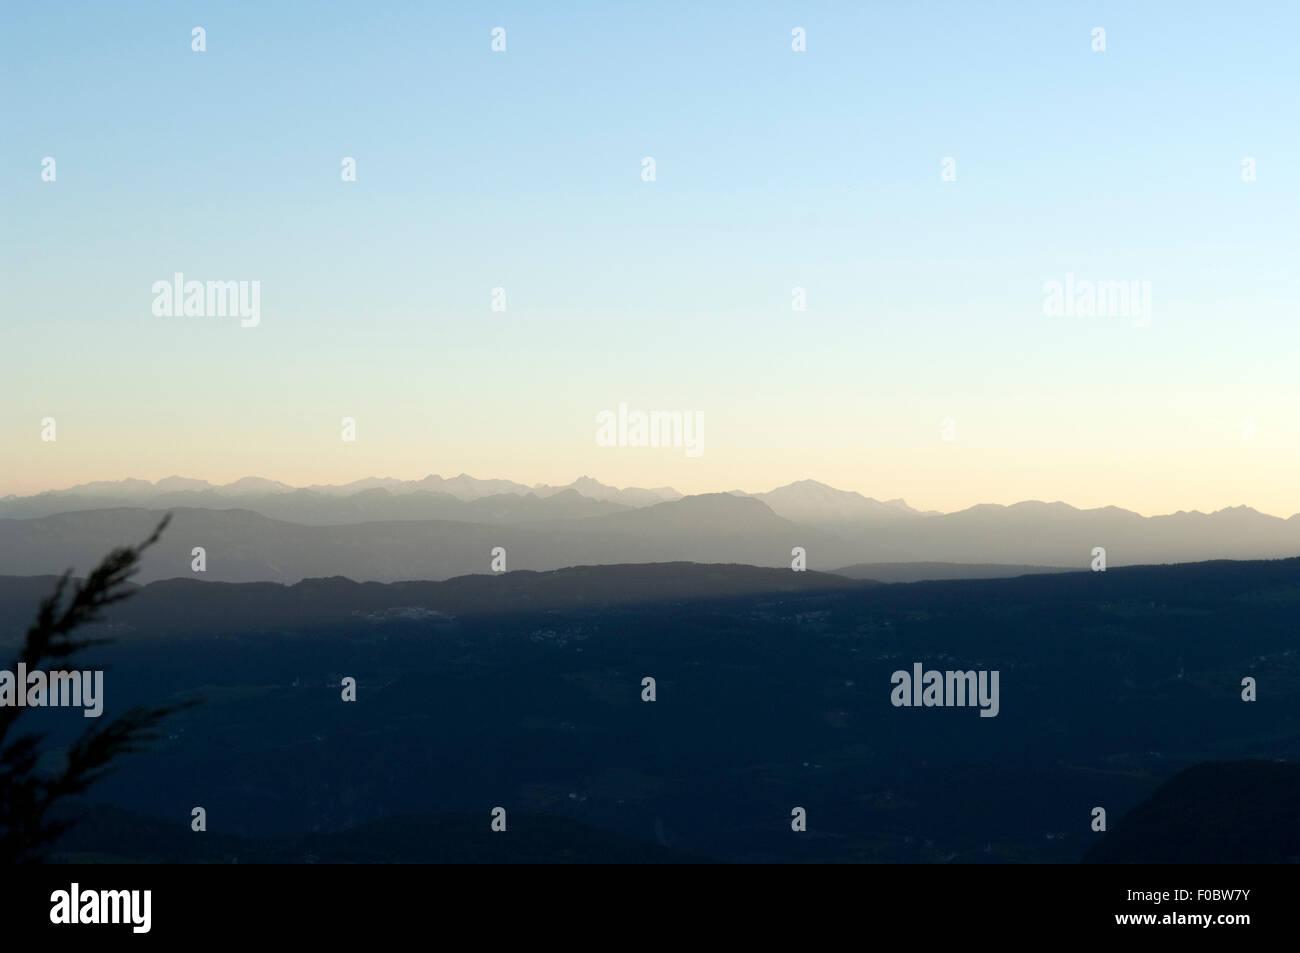 Bergprofil, Abend, Abendstimmung, profil, Oetztaler; Alpen; Seiser; Alm; Blick, Zillertaler - Stock Image